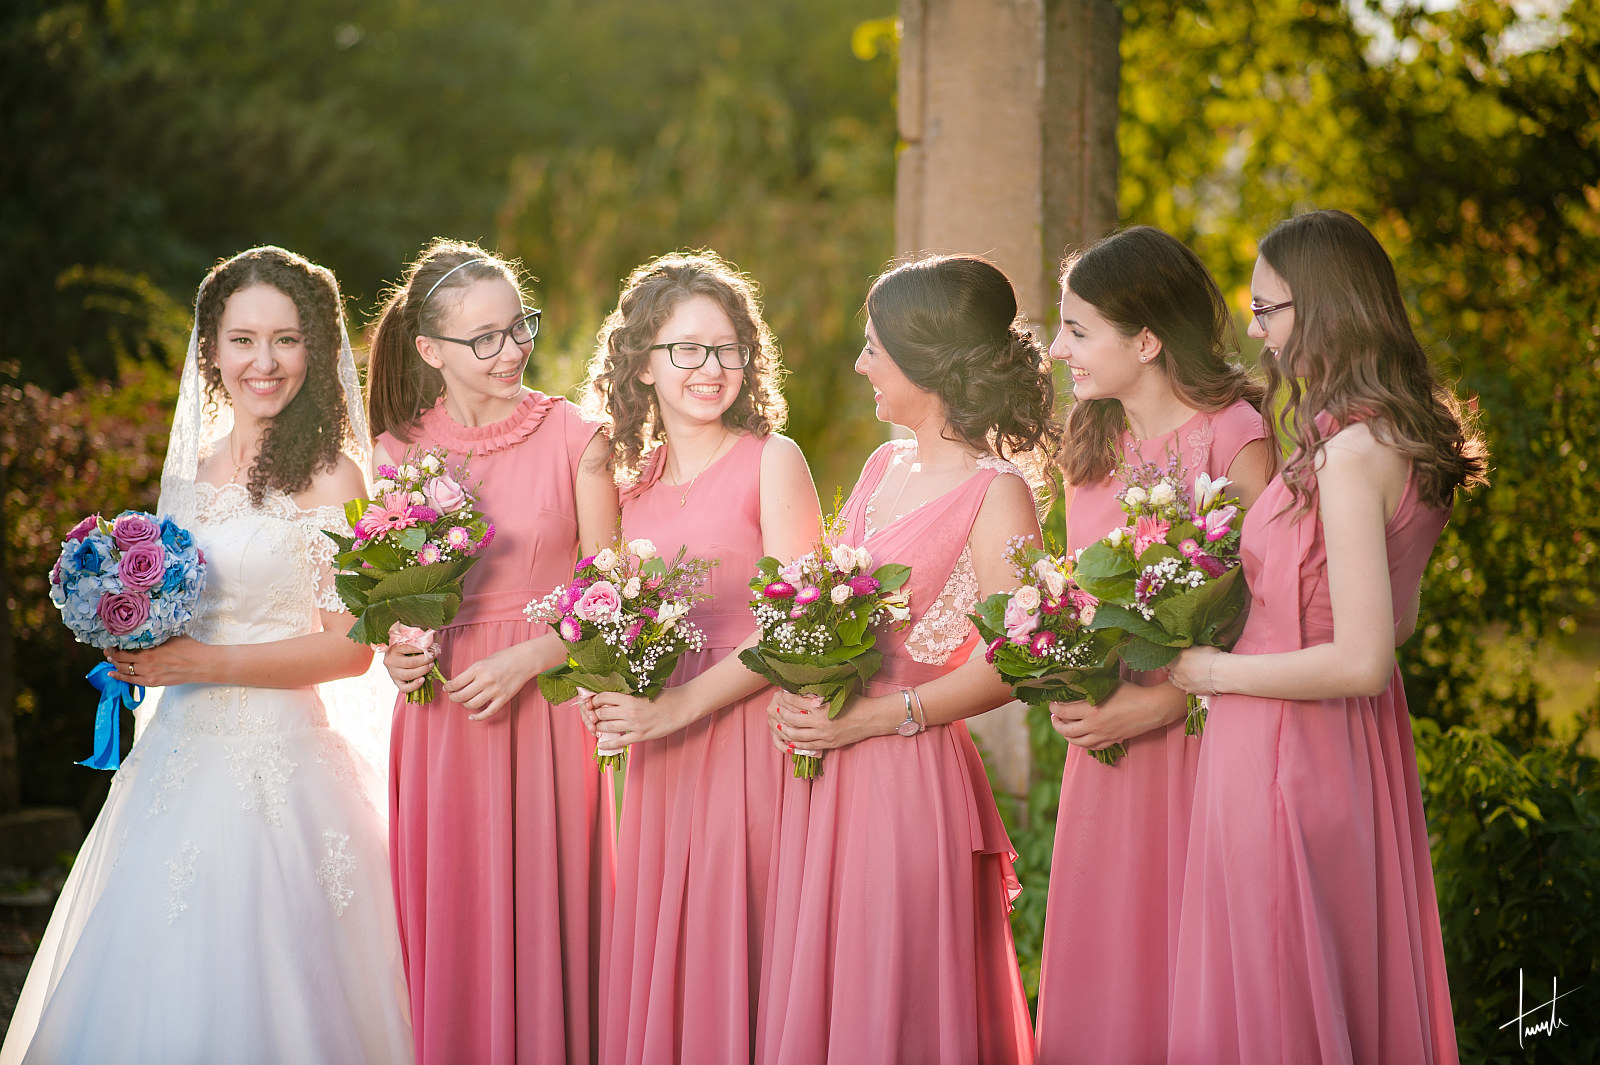 fotografie de nunta - Martha Ionut 11